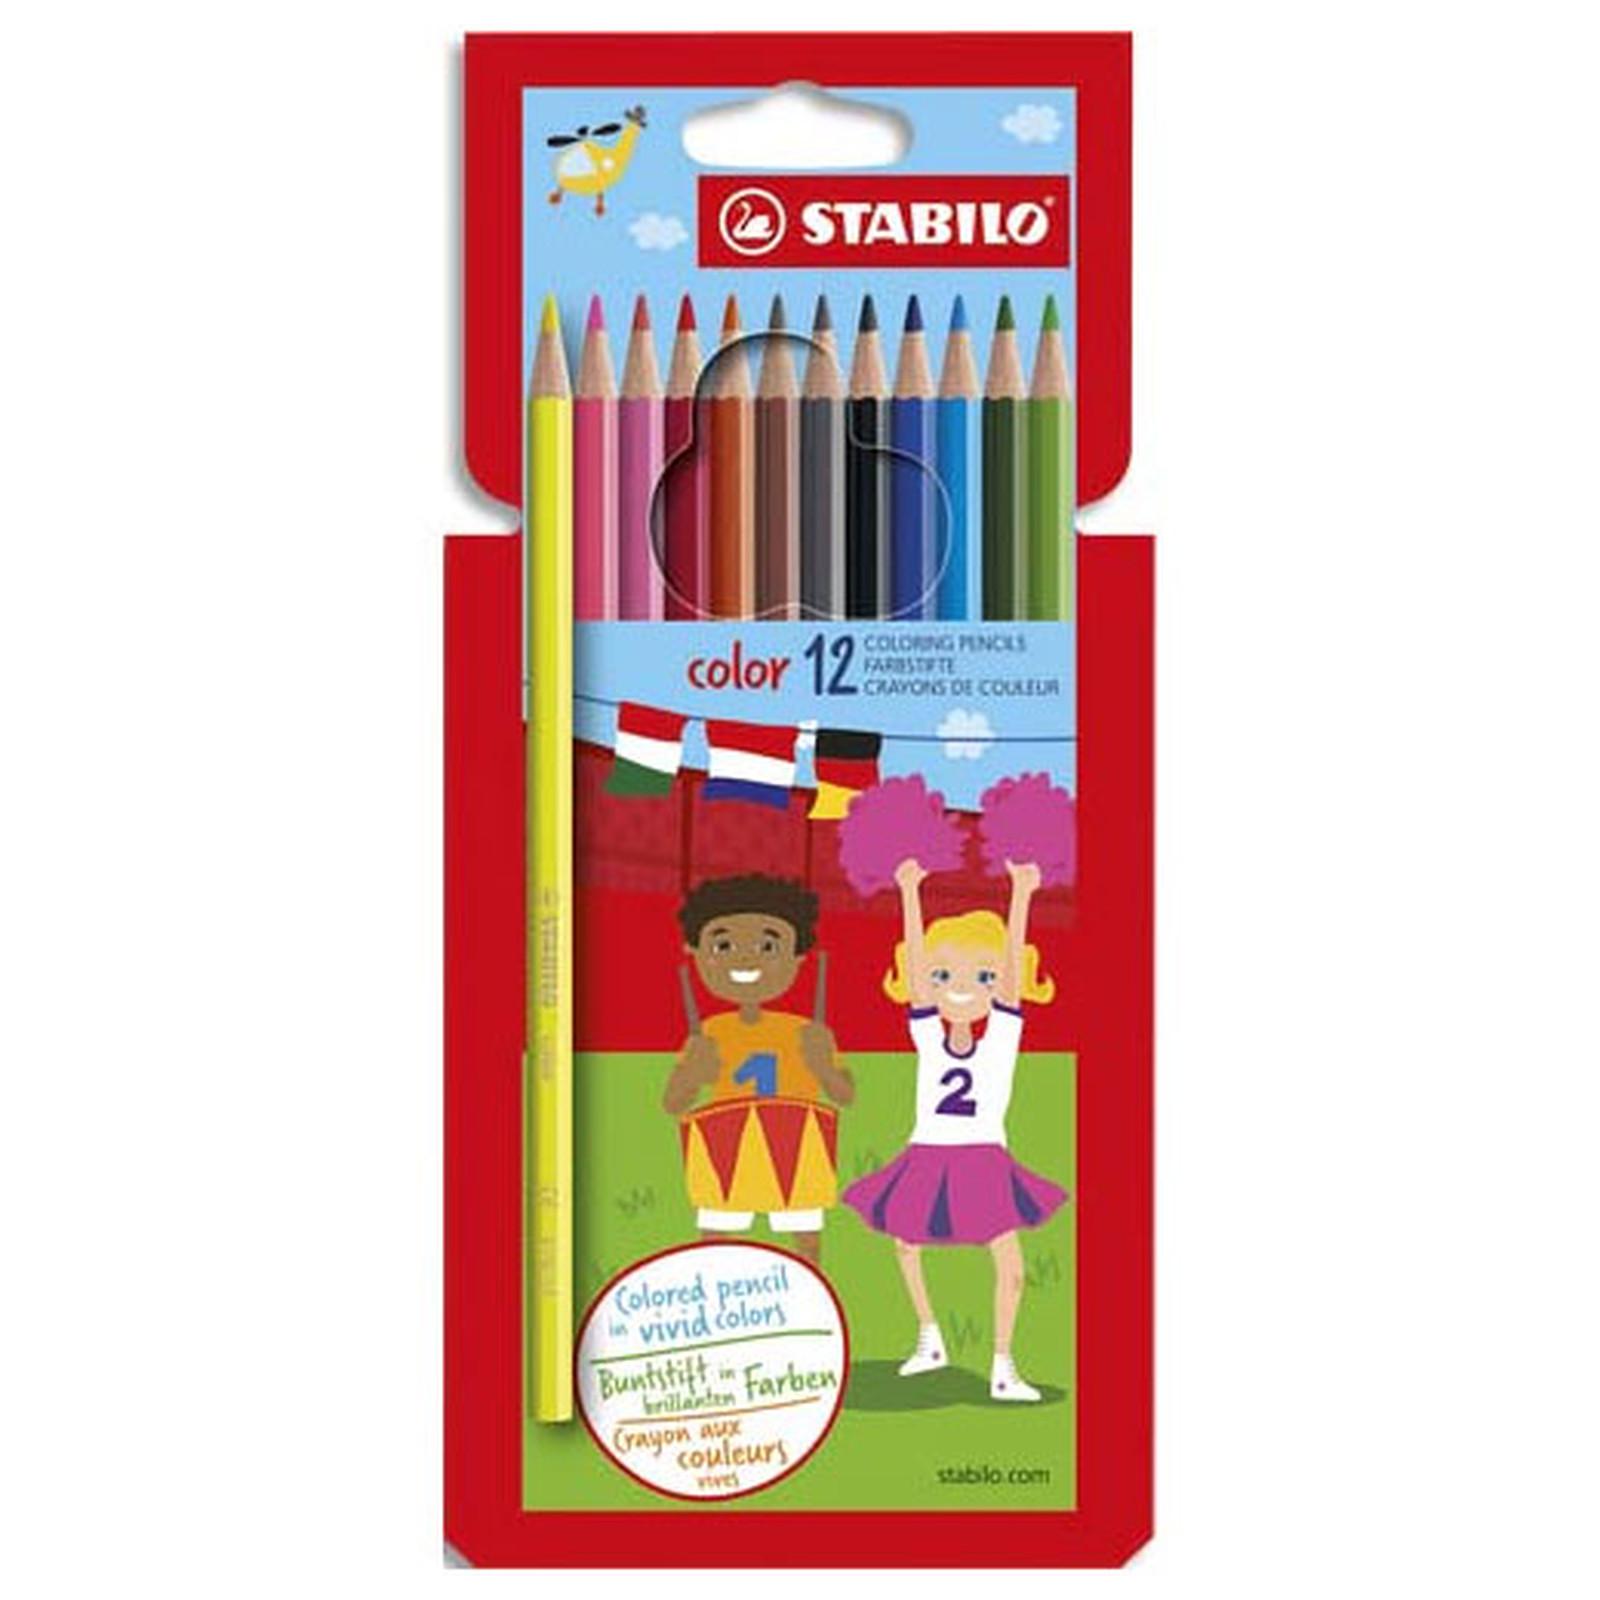 Stabilo Color - 12 crayons assortis